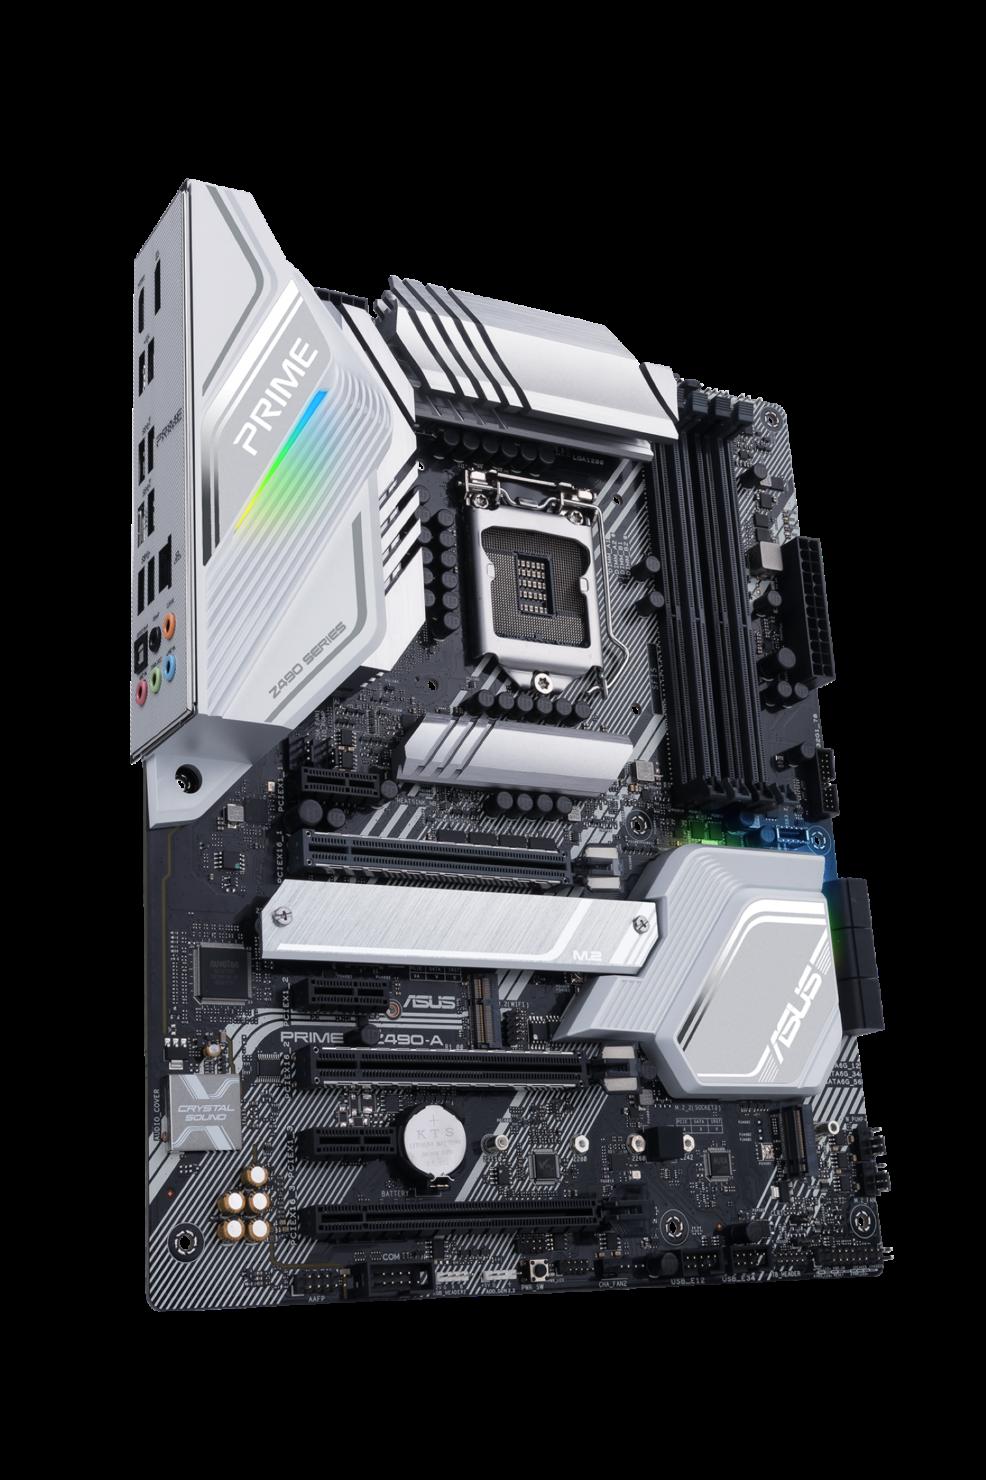 prime-z490-a-cover-aura-custom